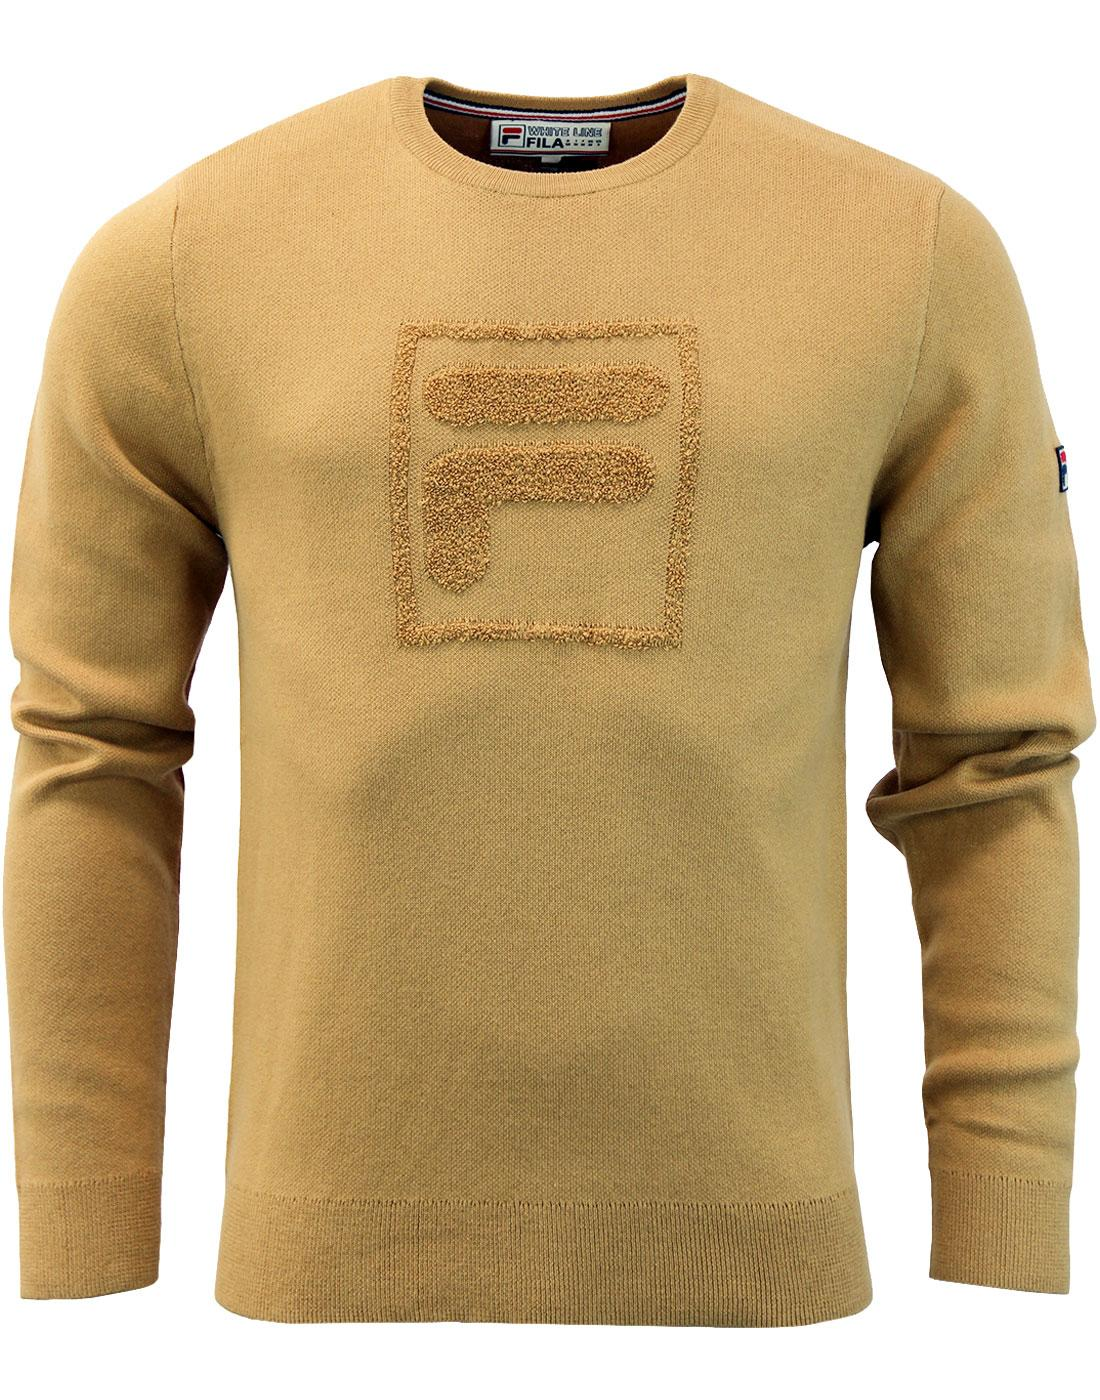 Savoldi FILA VINTAGE Knitted Texture Logo Jumper